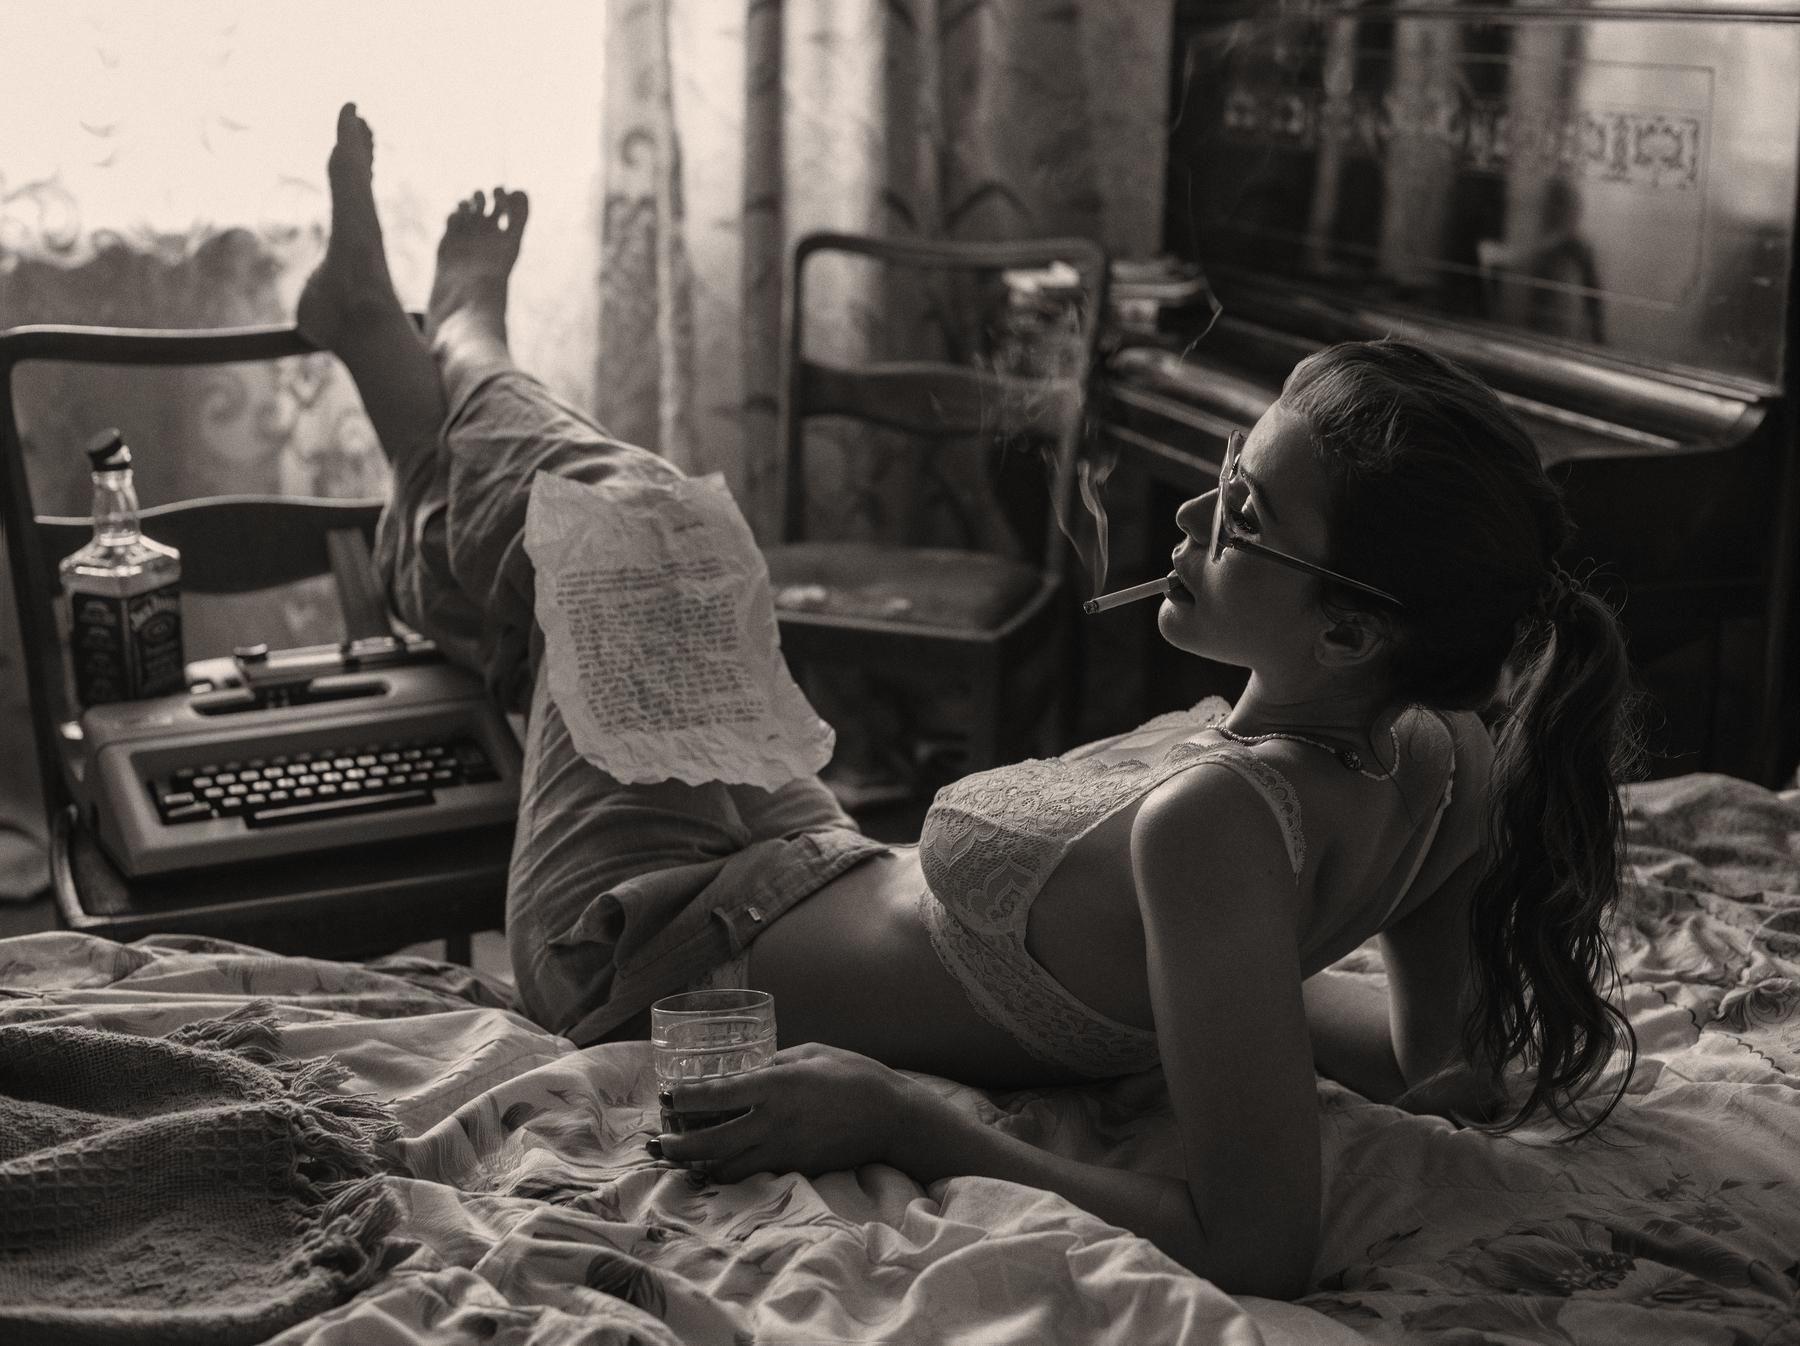 People 1800x1346 sepia women model cigarettes smoking women indoors bra typewriters barefoot David Dubnitskiy alcohol bottles Jack Daniel's whisky